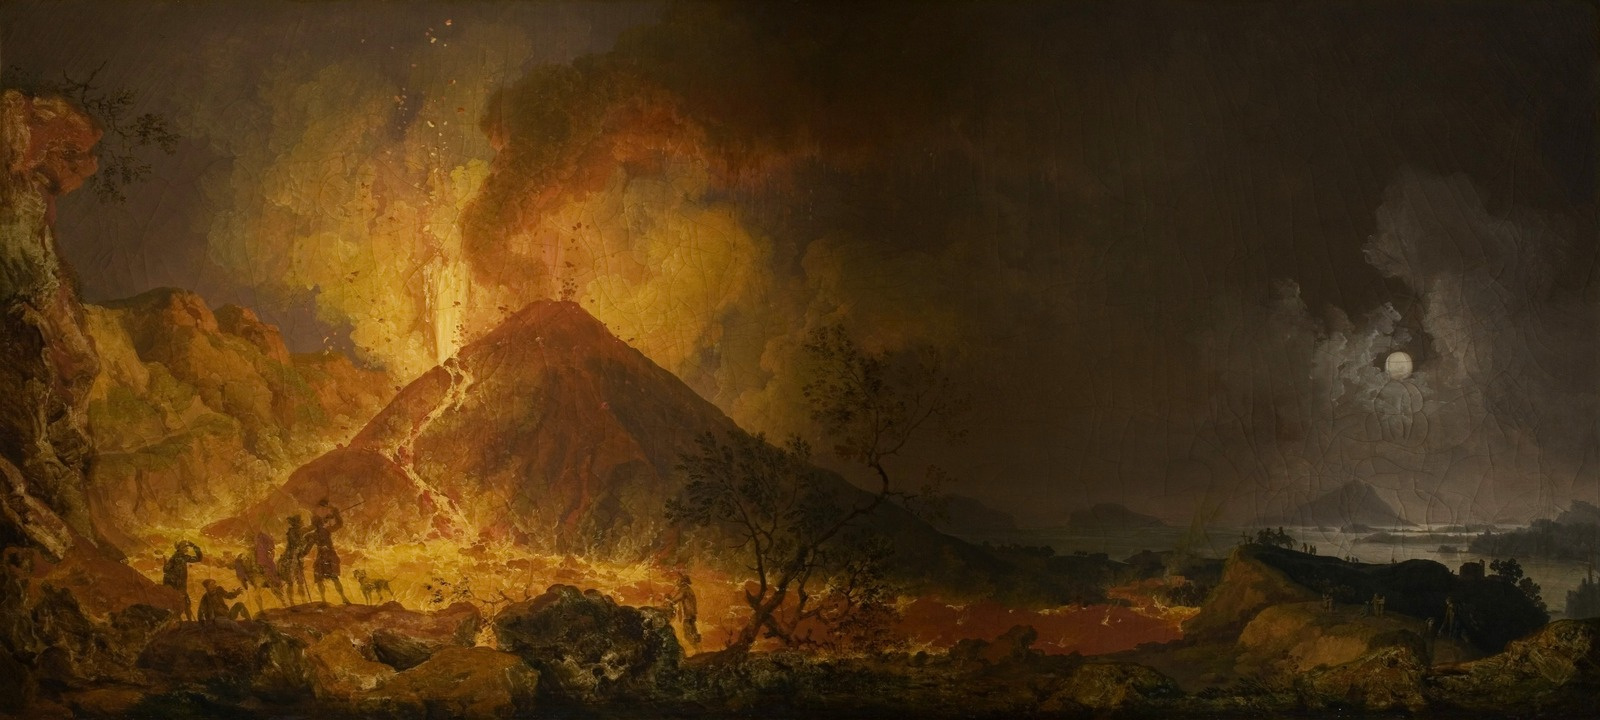 Pierre-Jacques Woller. The eruption of Vesuvius. 1771